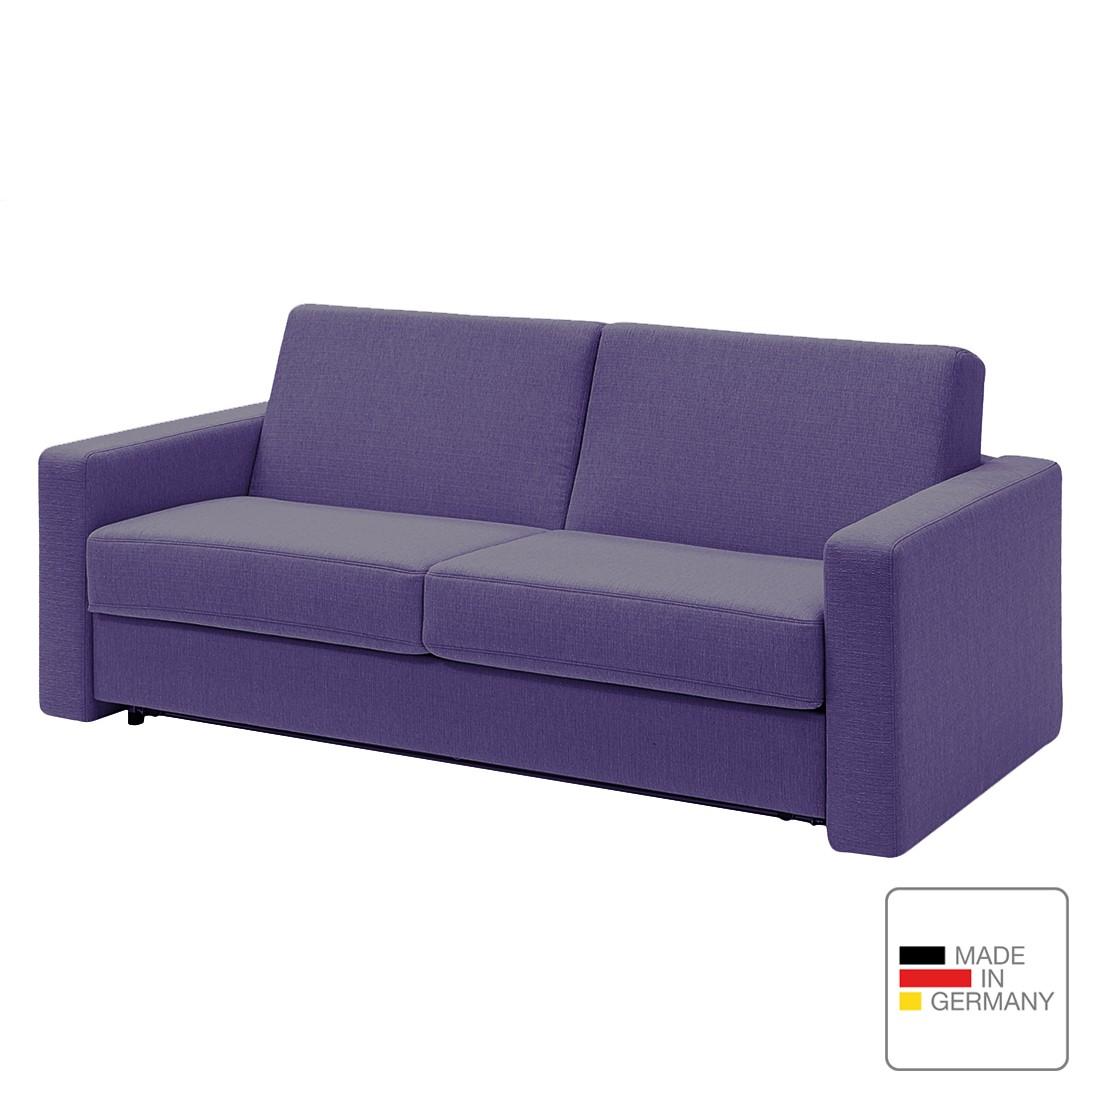 Schlafsofa pidaro ii webstoff kaltschaum violett for Schlafsofa bestellen